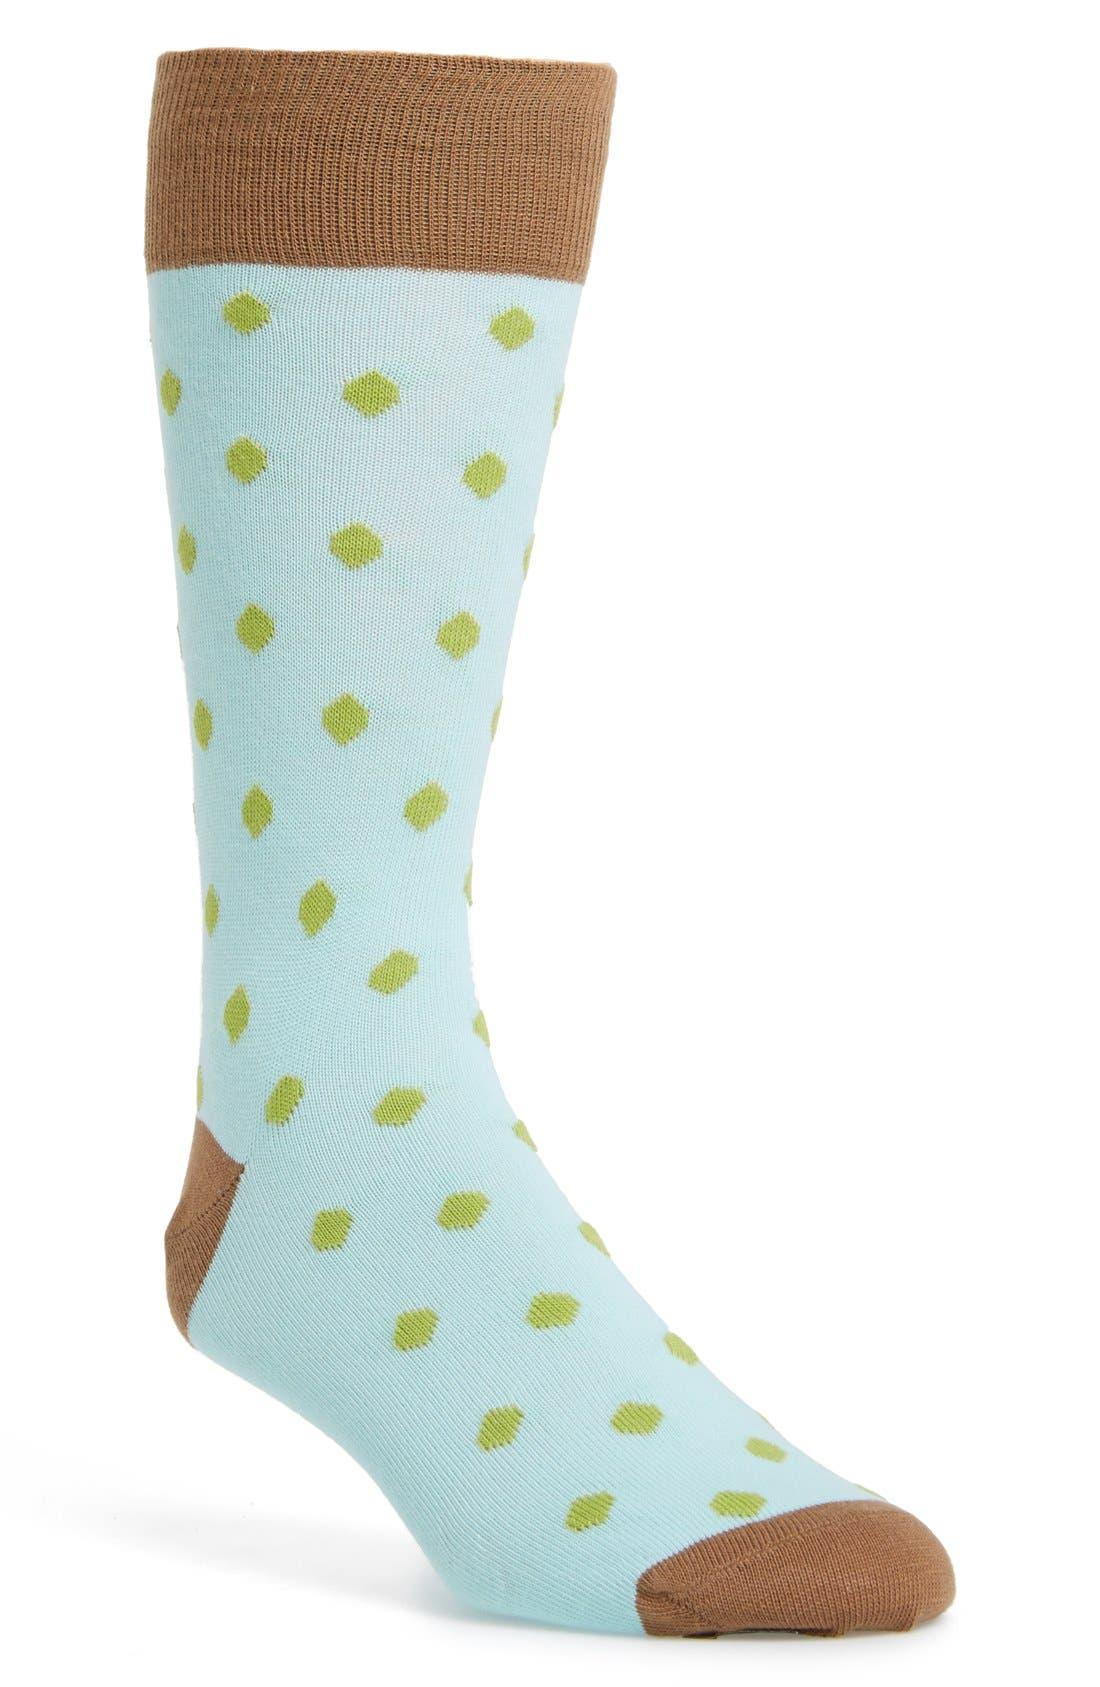 Alternate Image 1 Selected - Lorenzo Uomo Organic Leaf Dot Socks